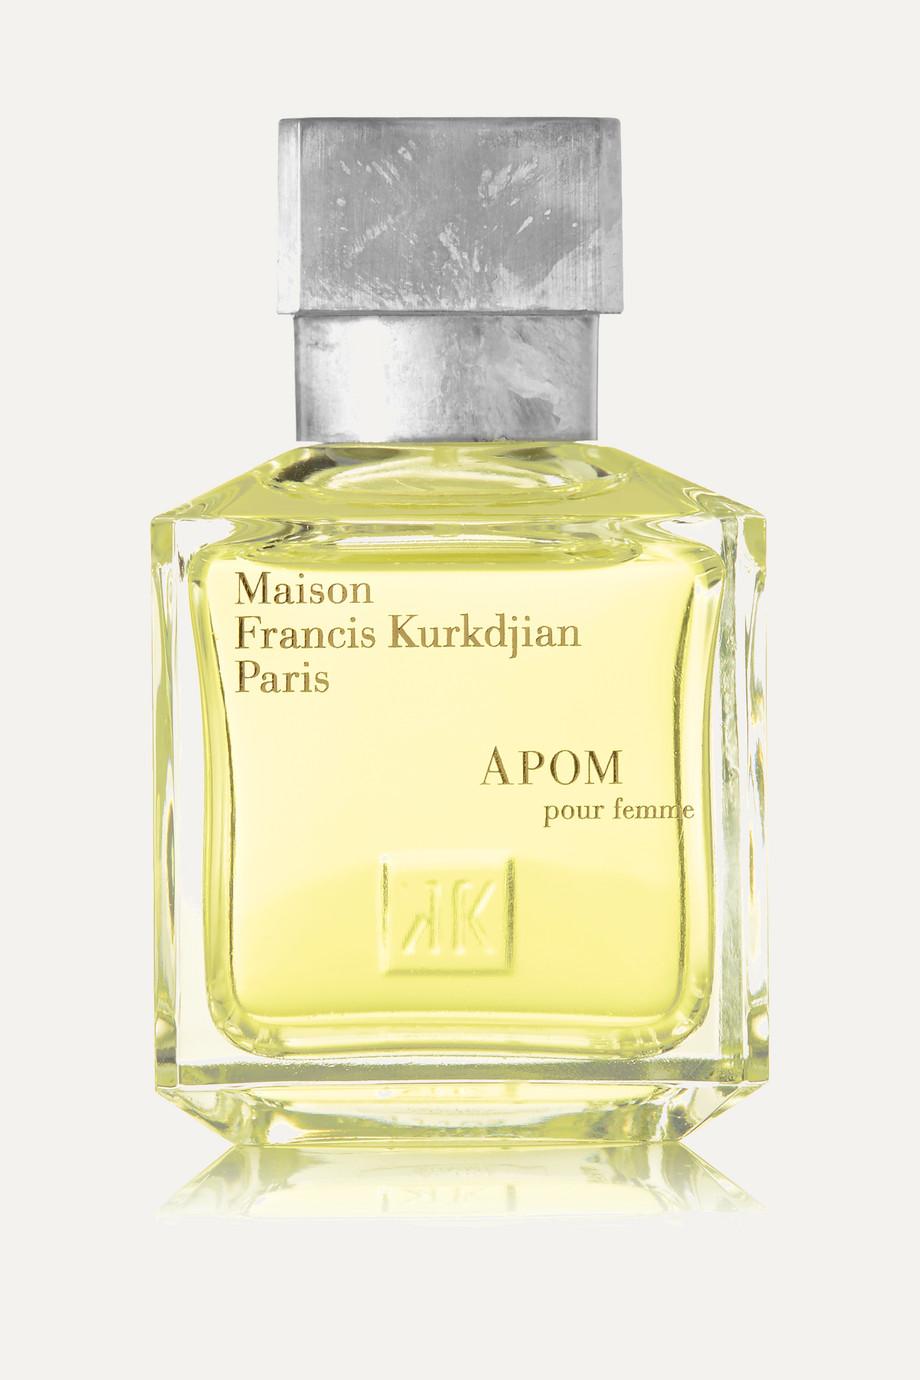 Eau De Parfum - Apom Femme, 70ml, by Maison Francis Kurkdjian